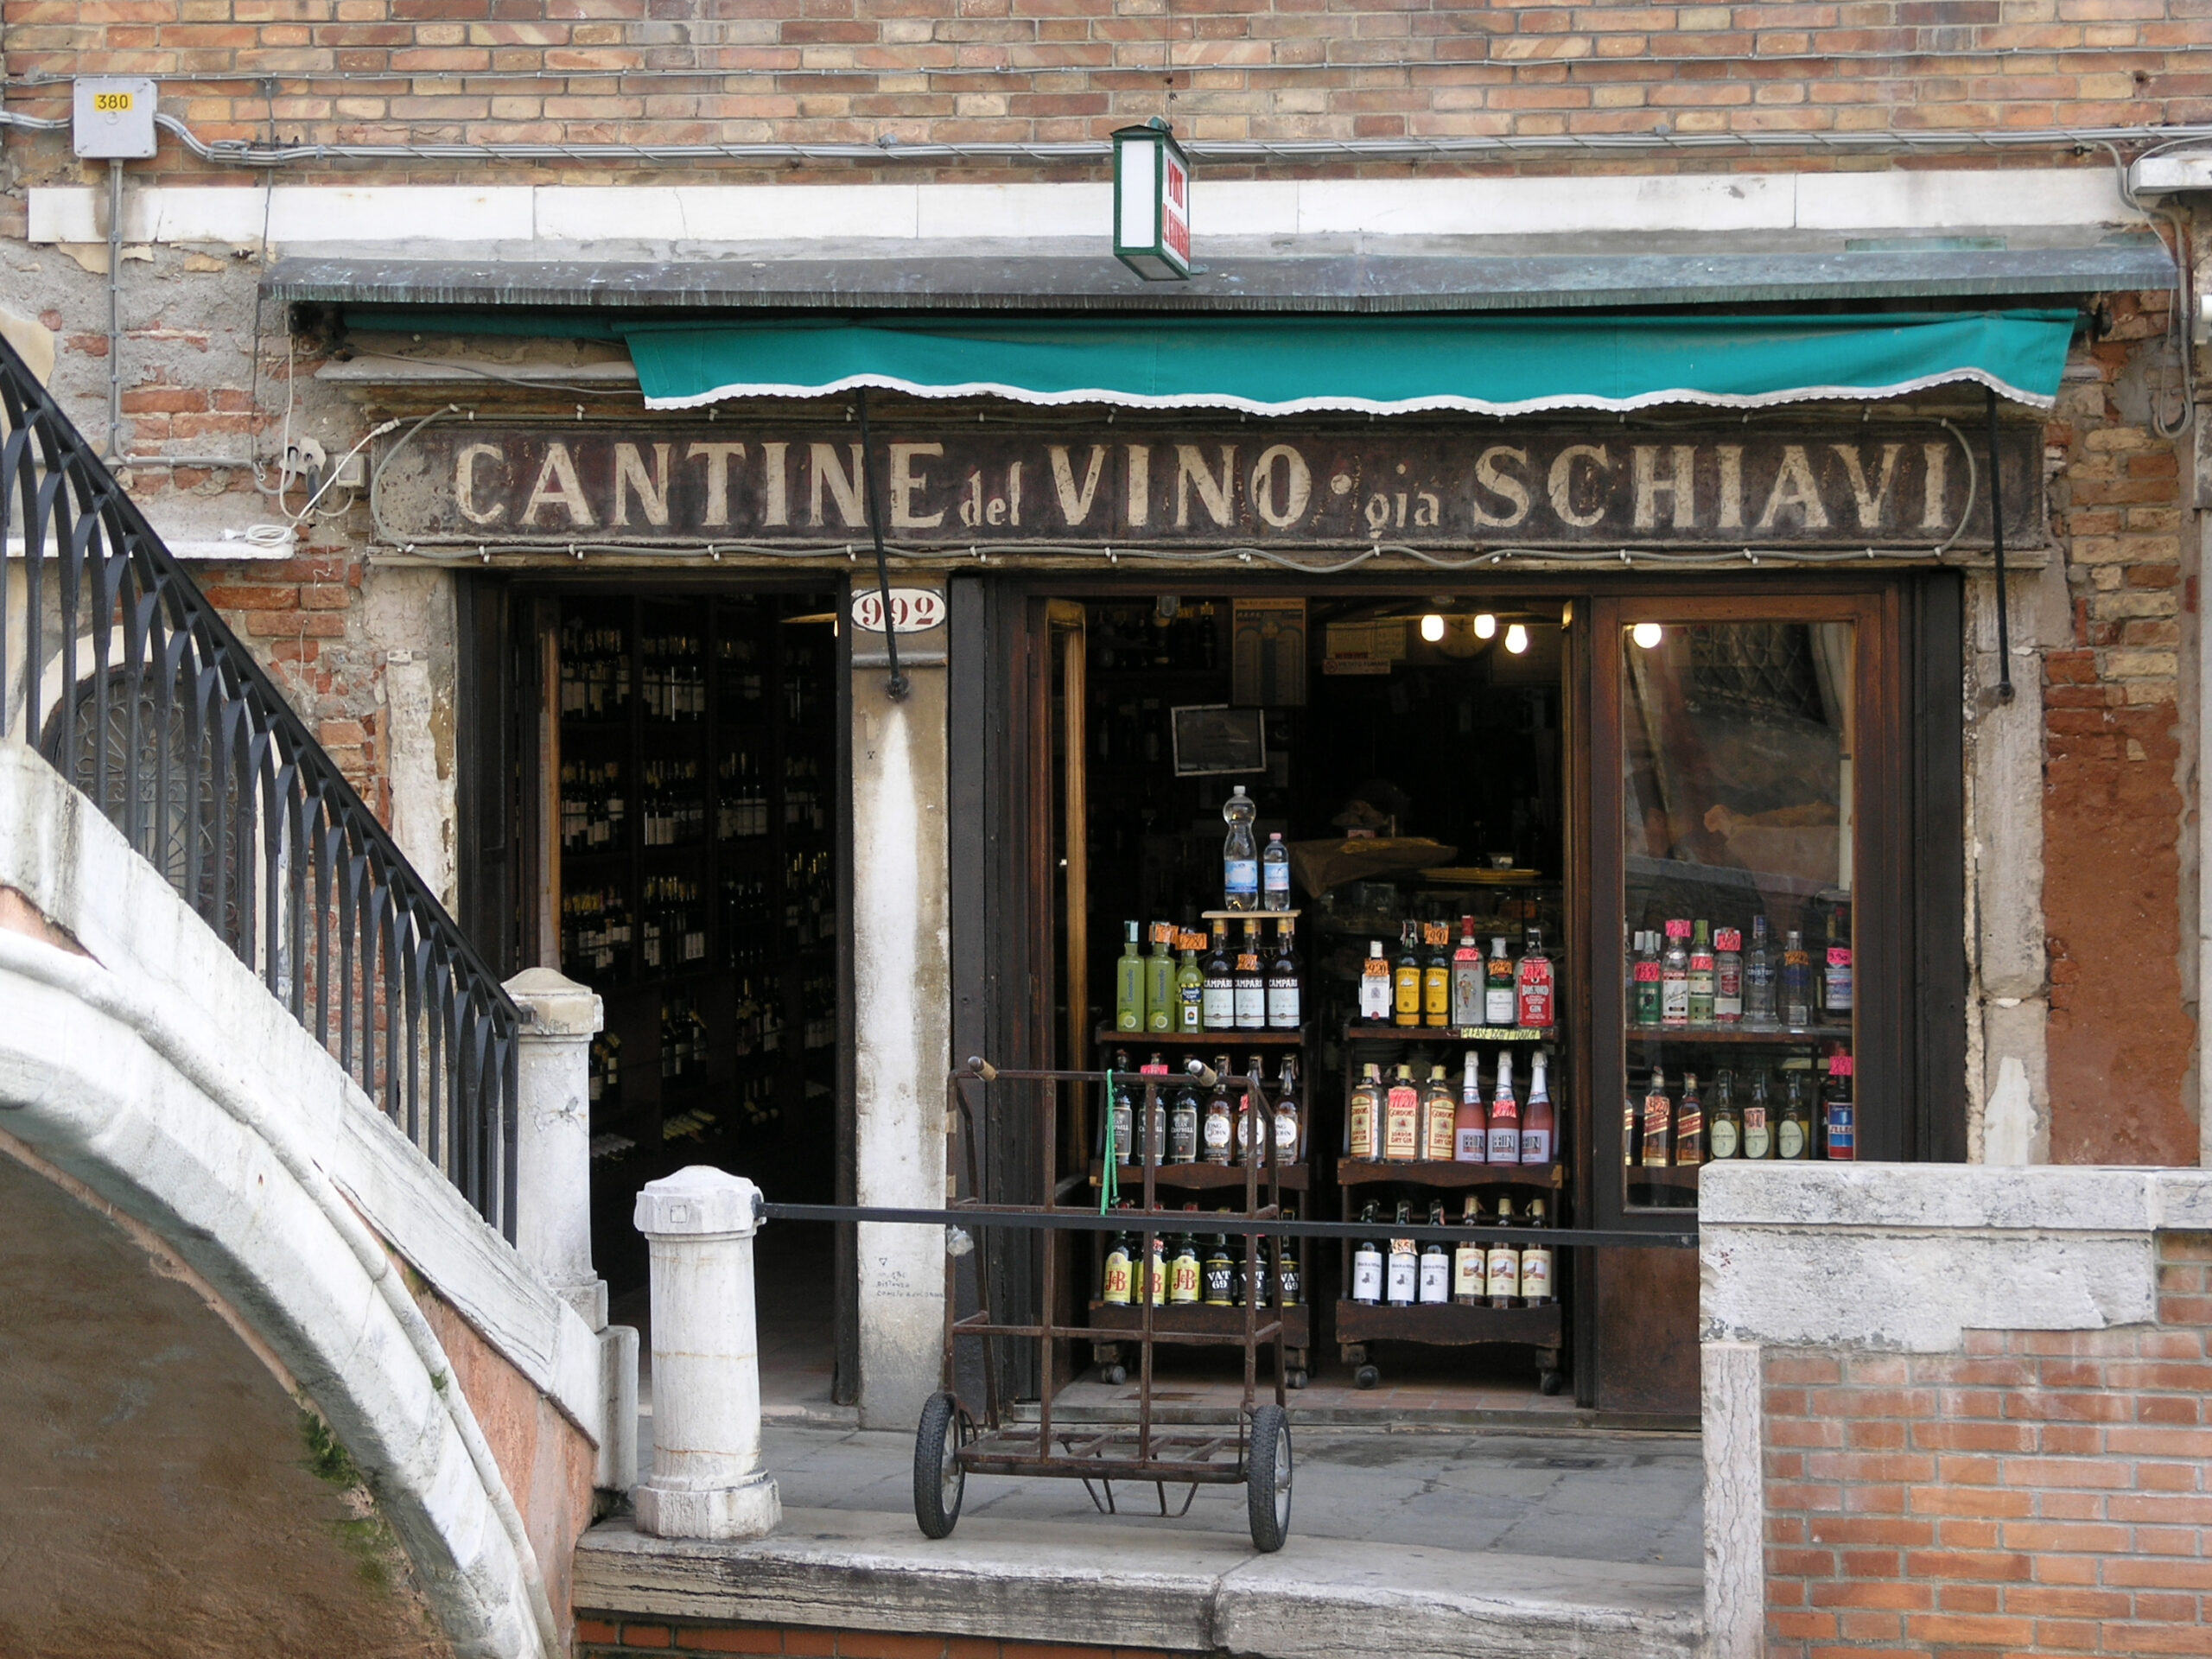 Cantine del Vino gia Schiavi